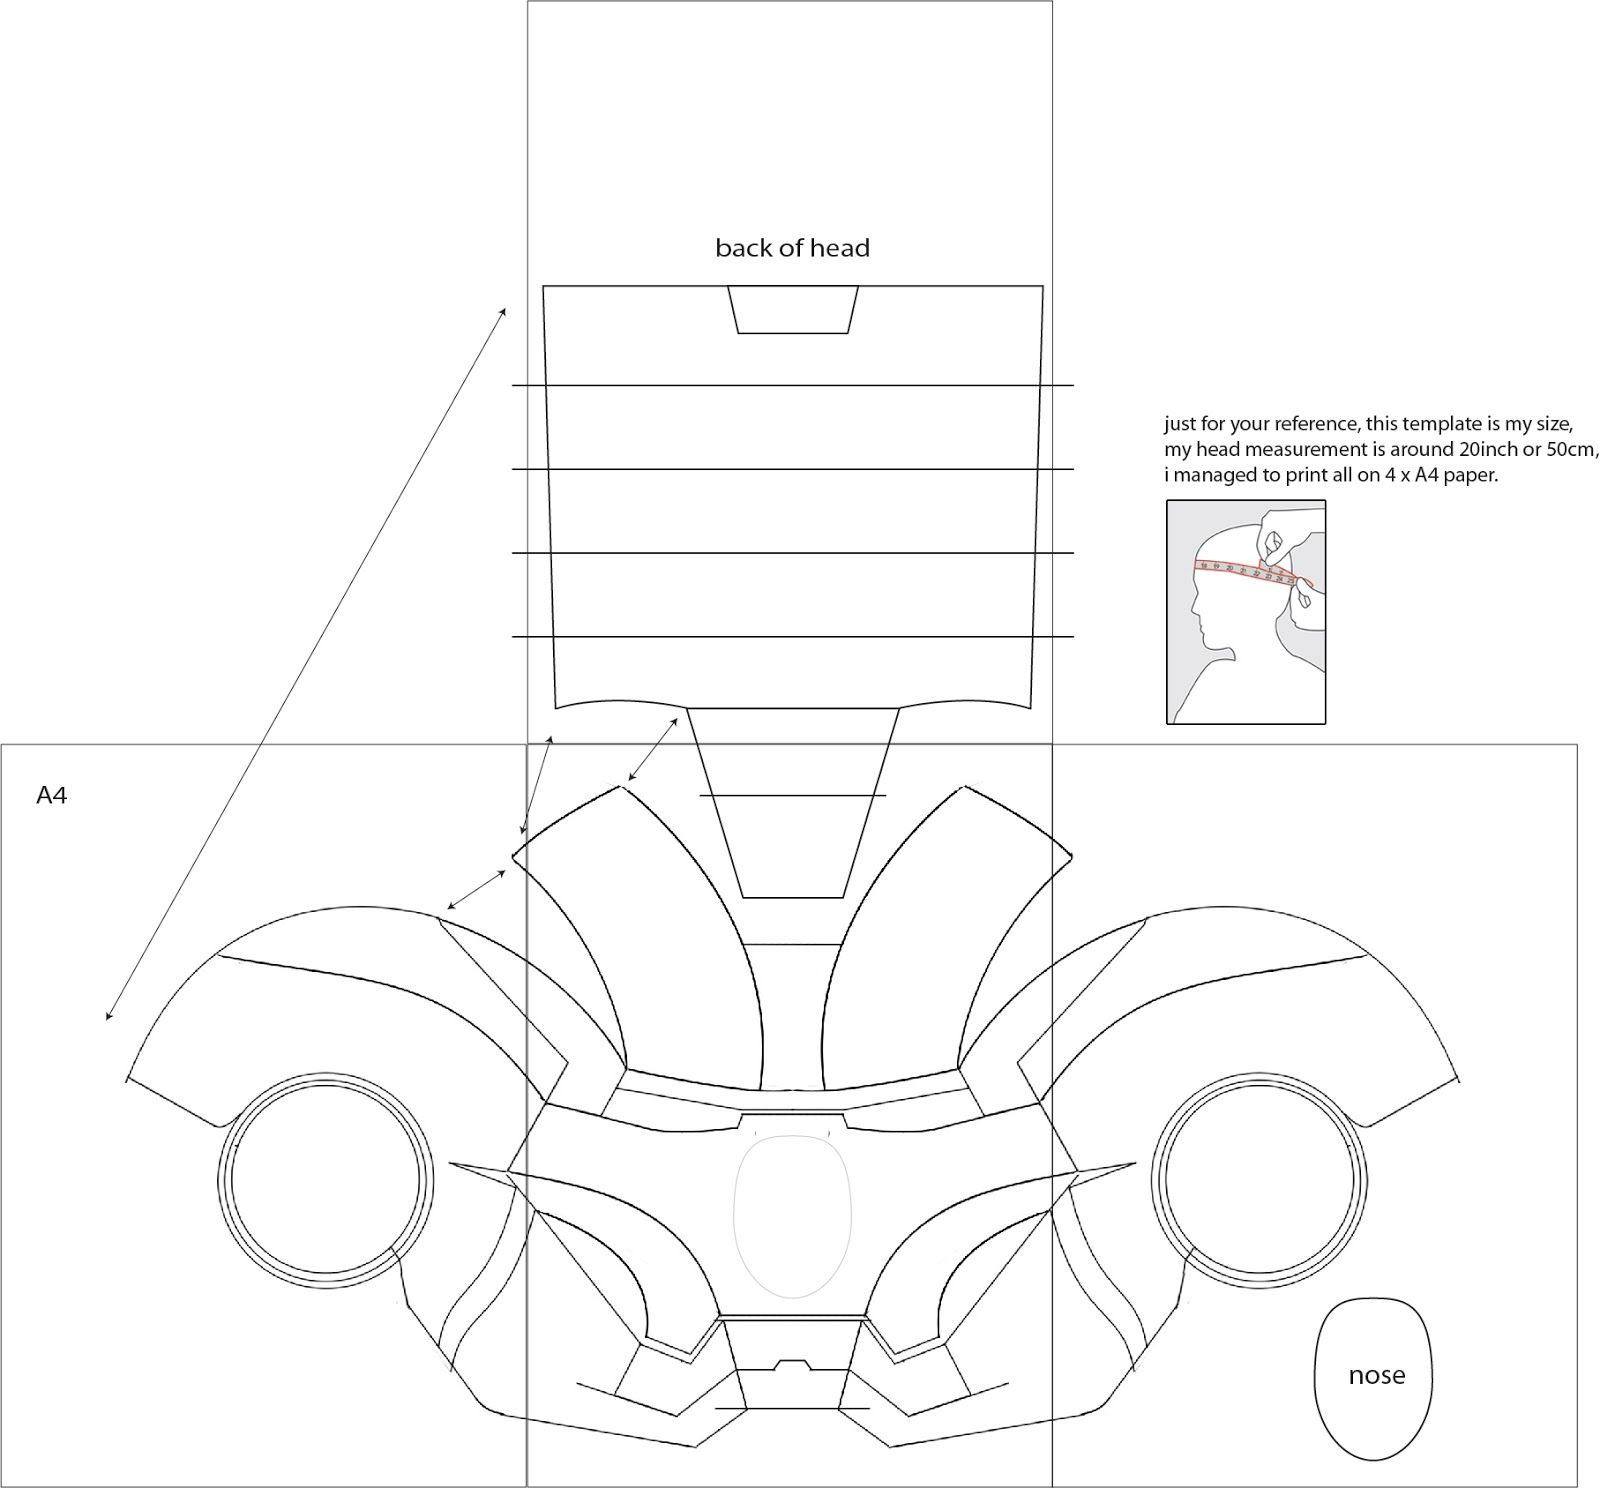 iron man 4 costume helmet diy cardboard with template